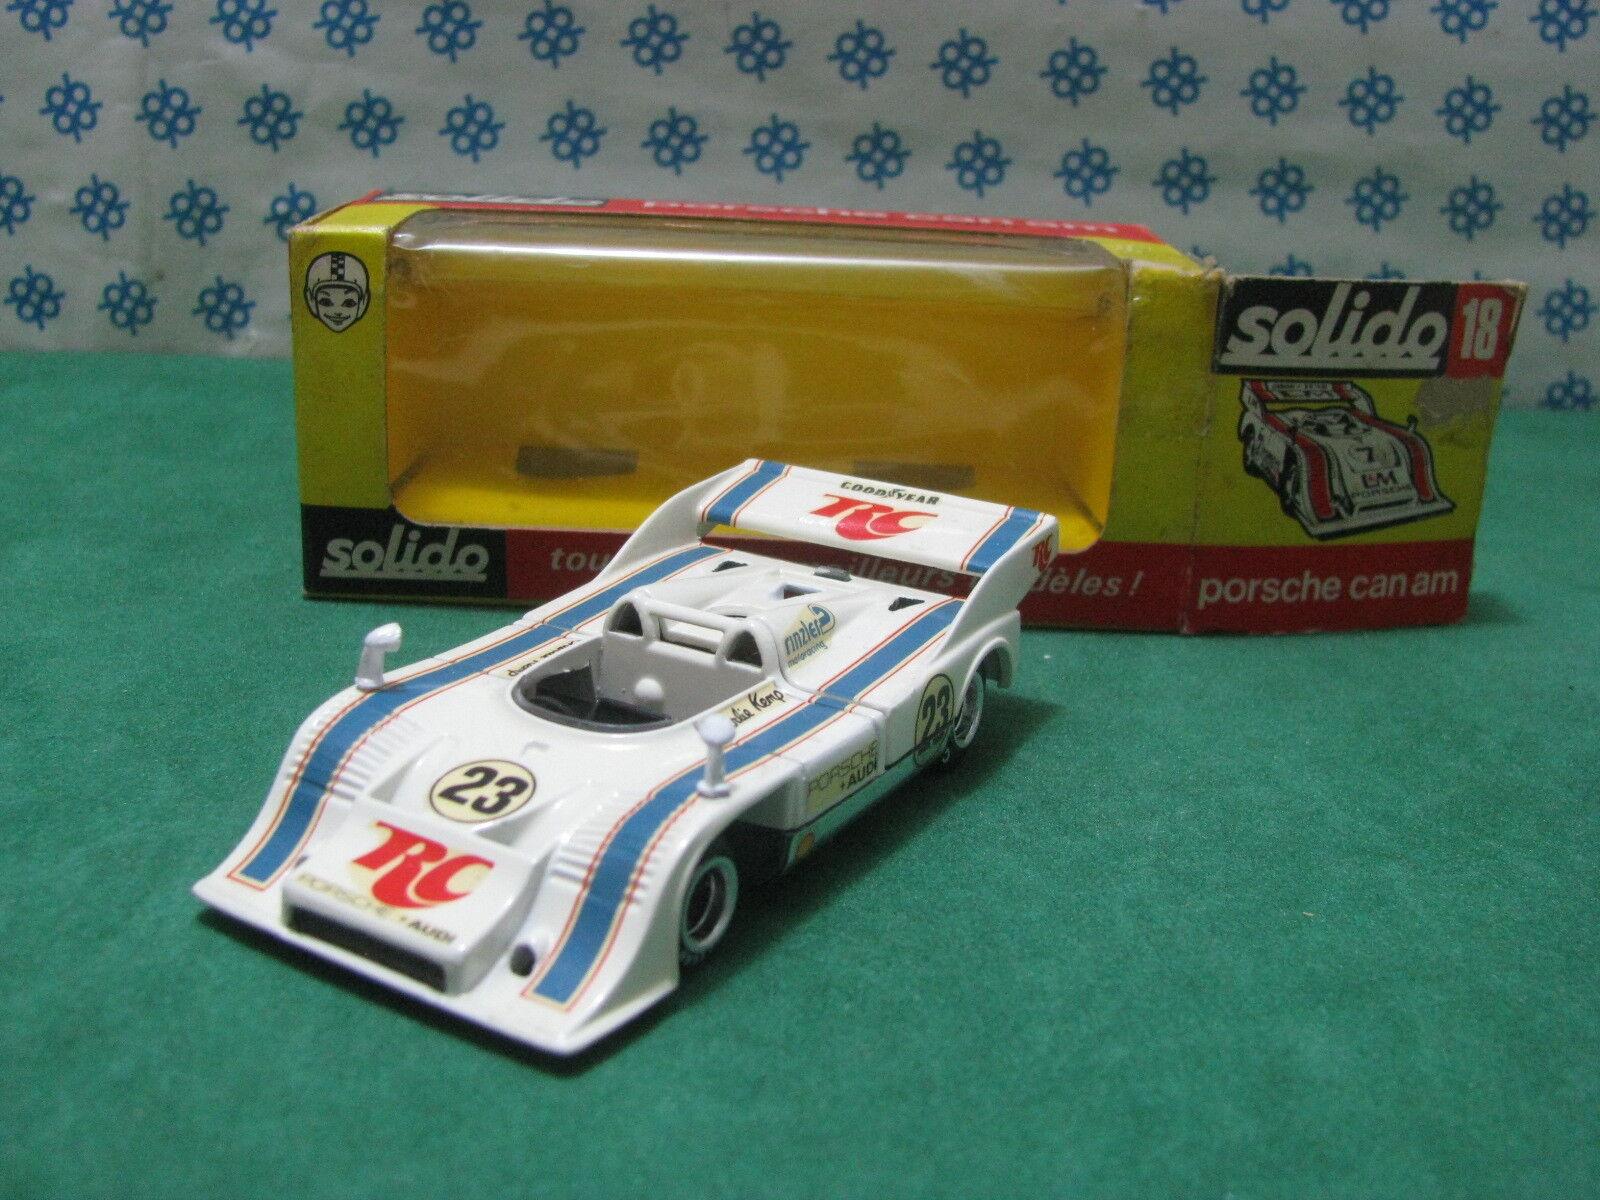 Vintage - PORSCHE 917/10 T.C. Can-Am  Charlie Kemp  - 1/43 Solido n 18